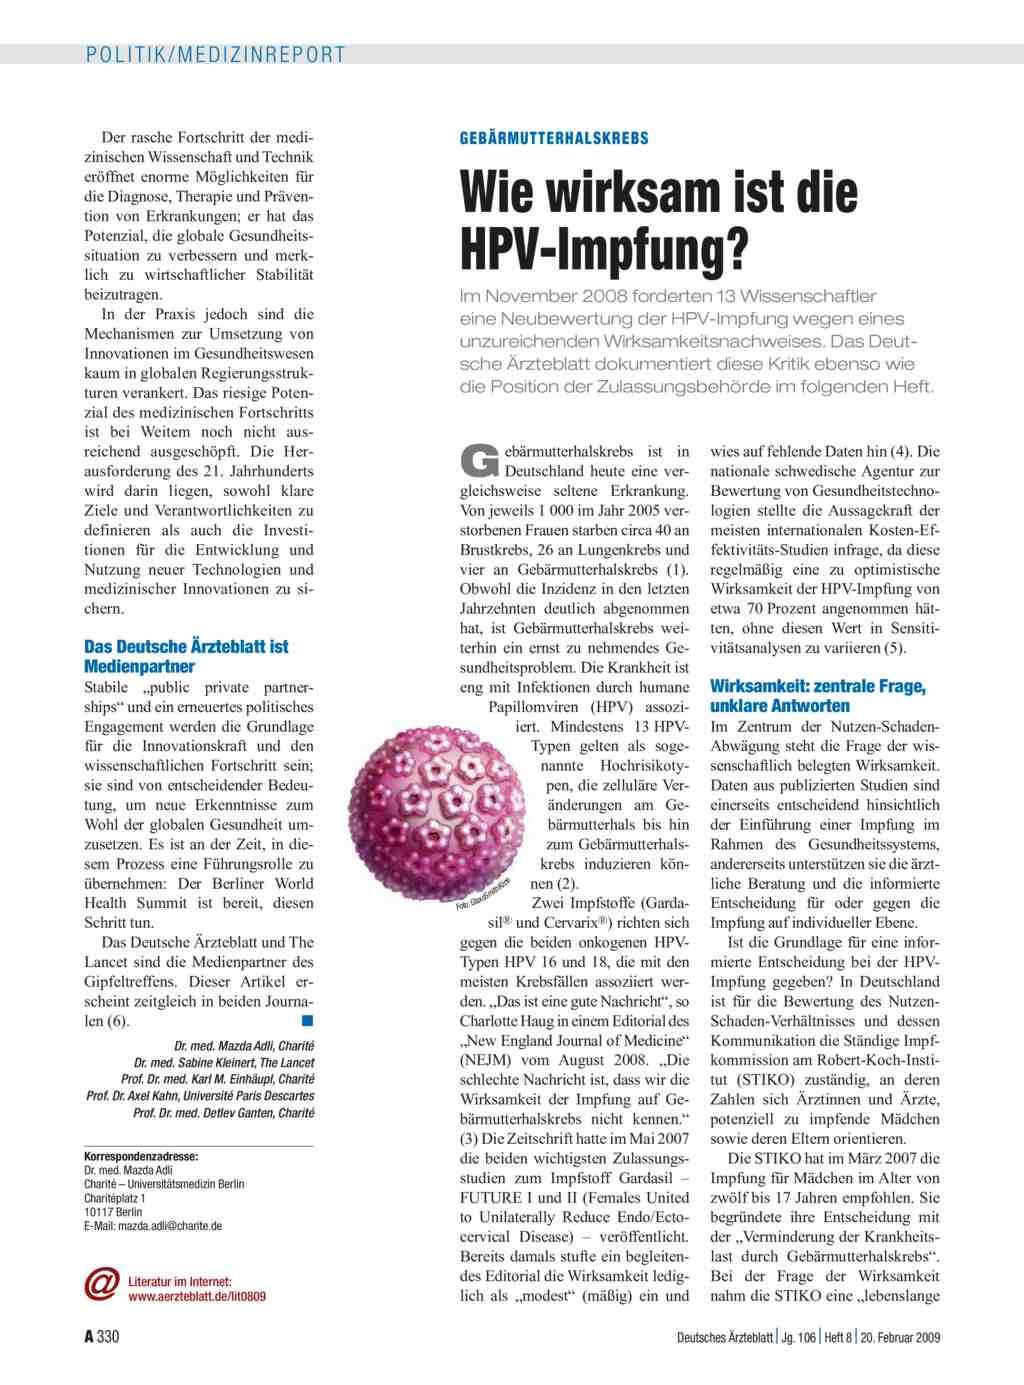 hpv positive oropharyngeal cancer icd 10 cancerul afecteaza creierul